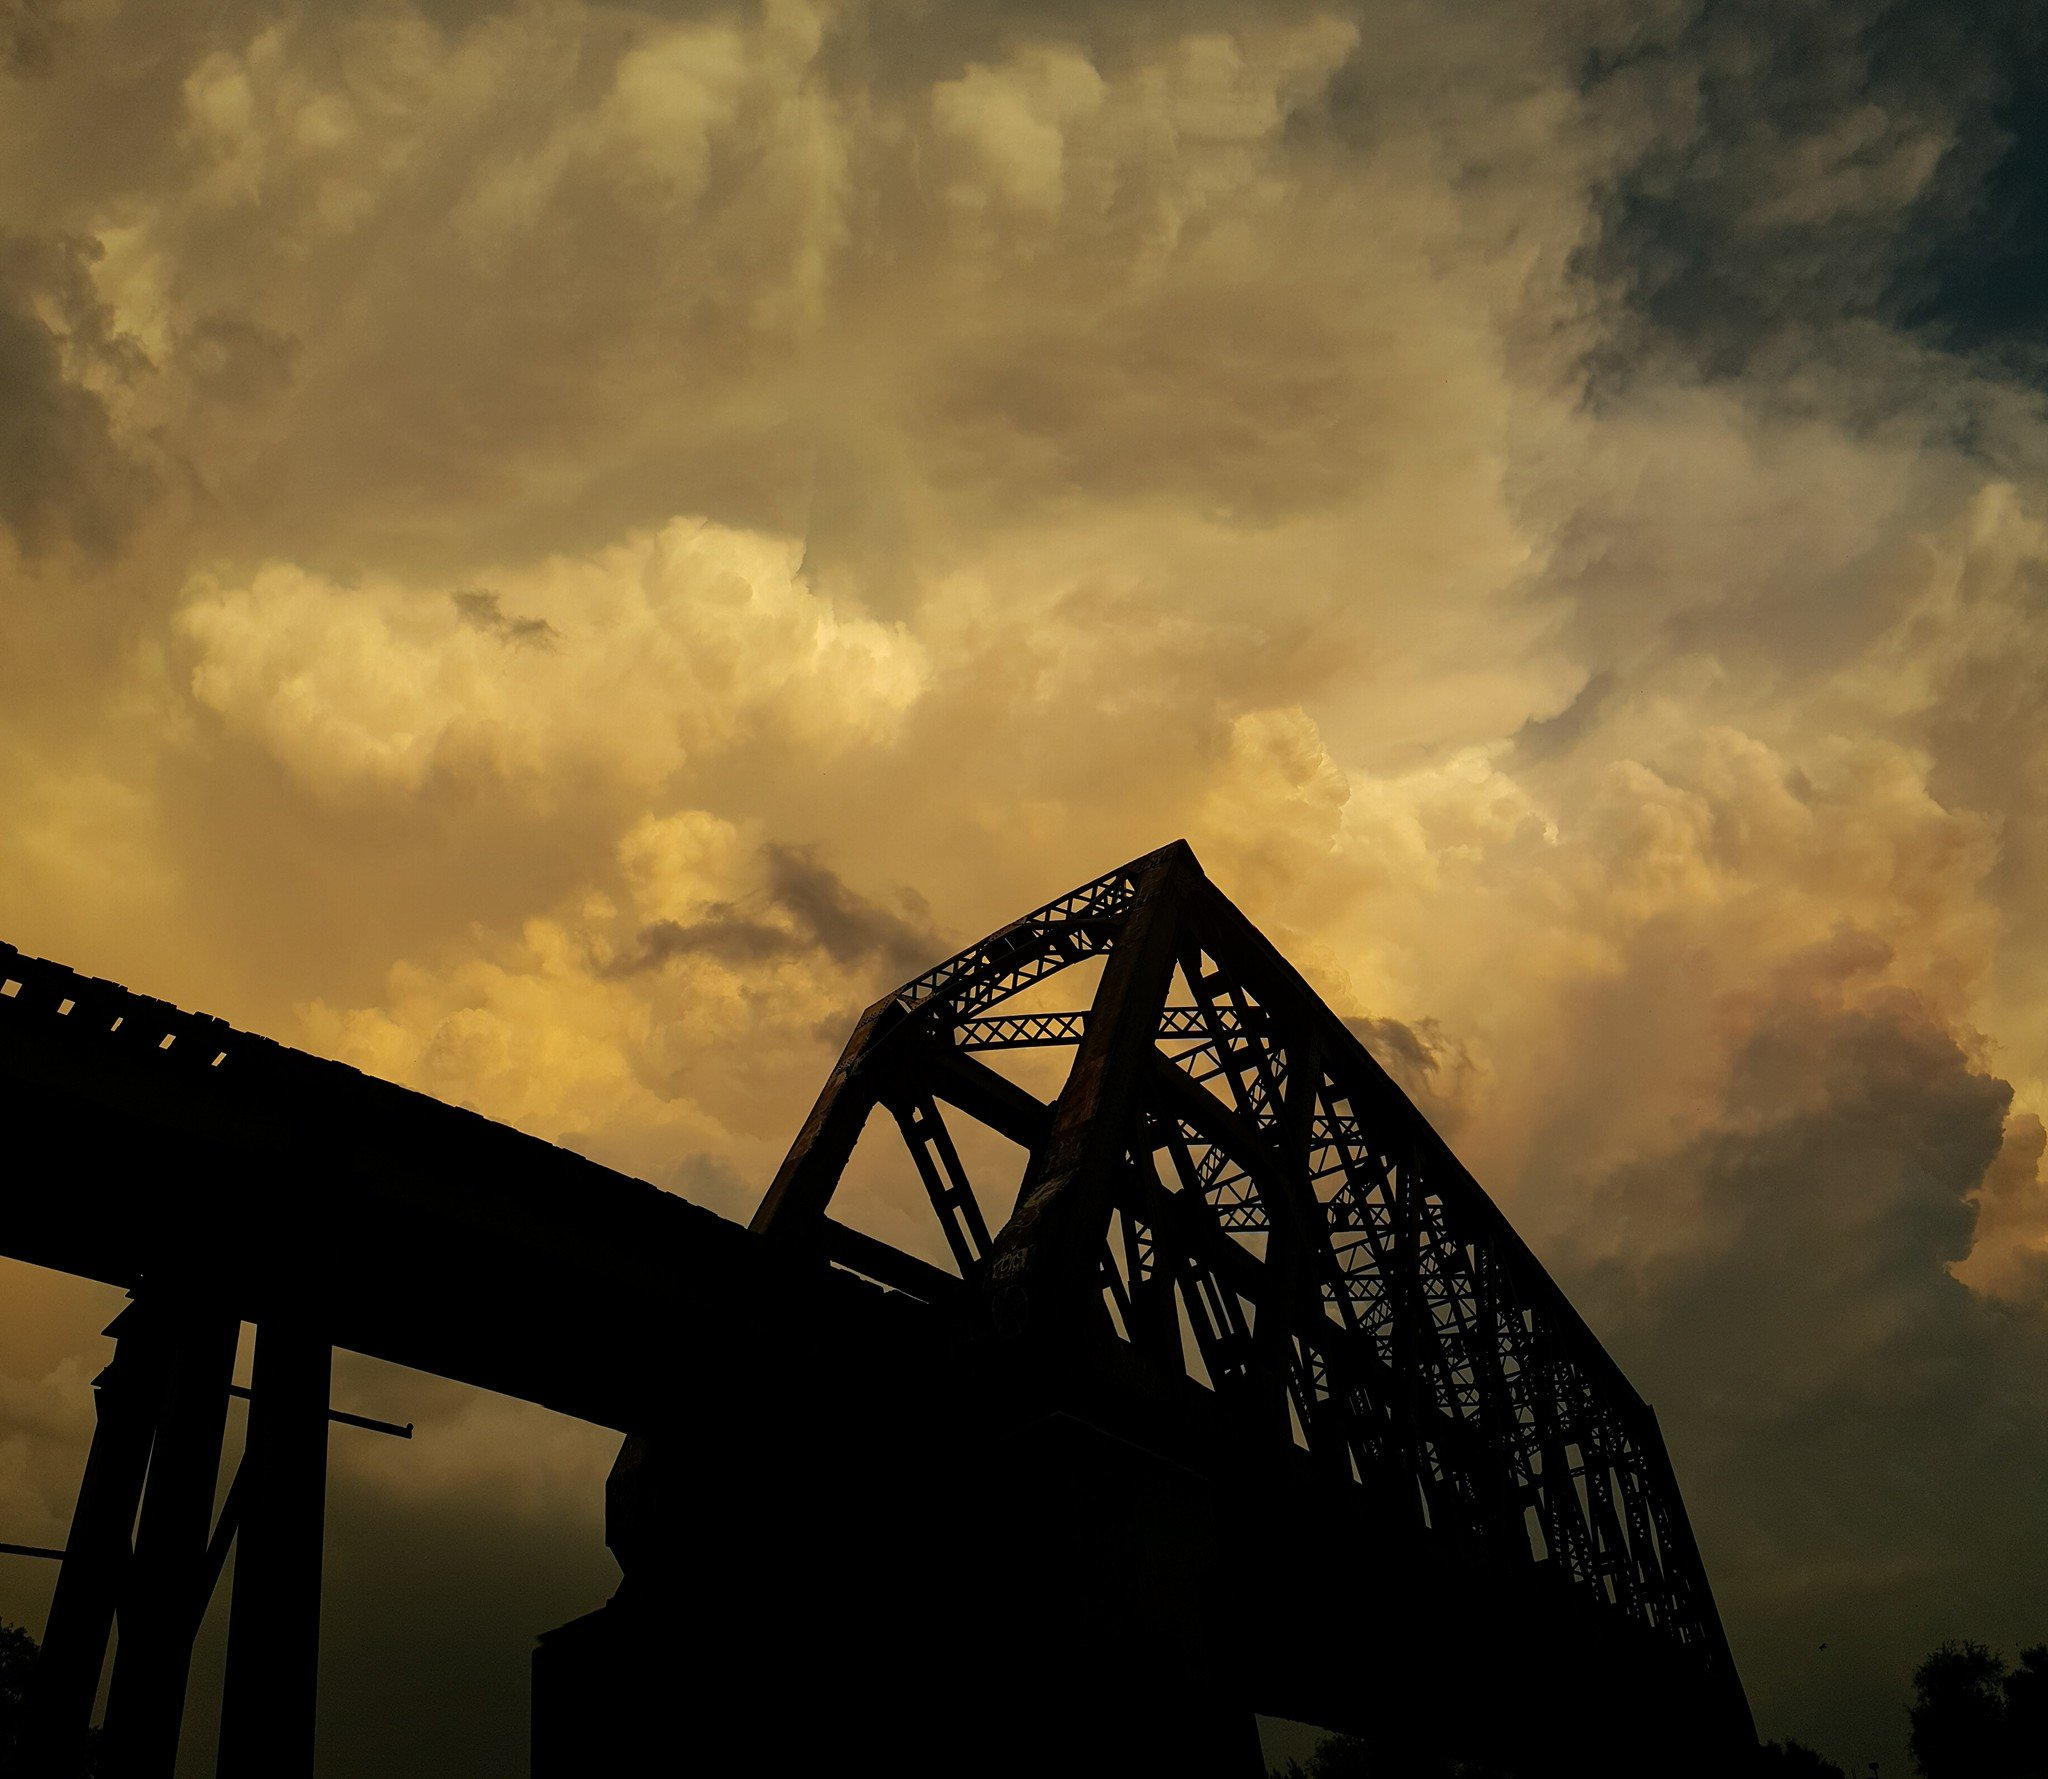 Severe weather, tornado causes damage in Arkansas City - KTEN.com ...